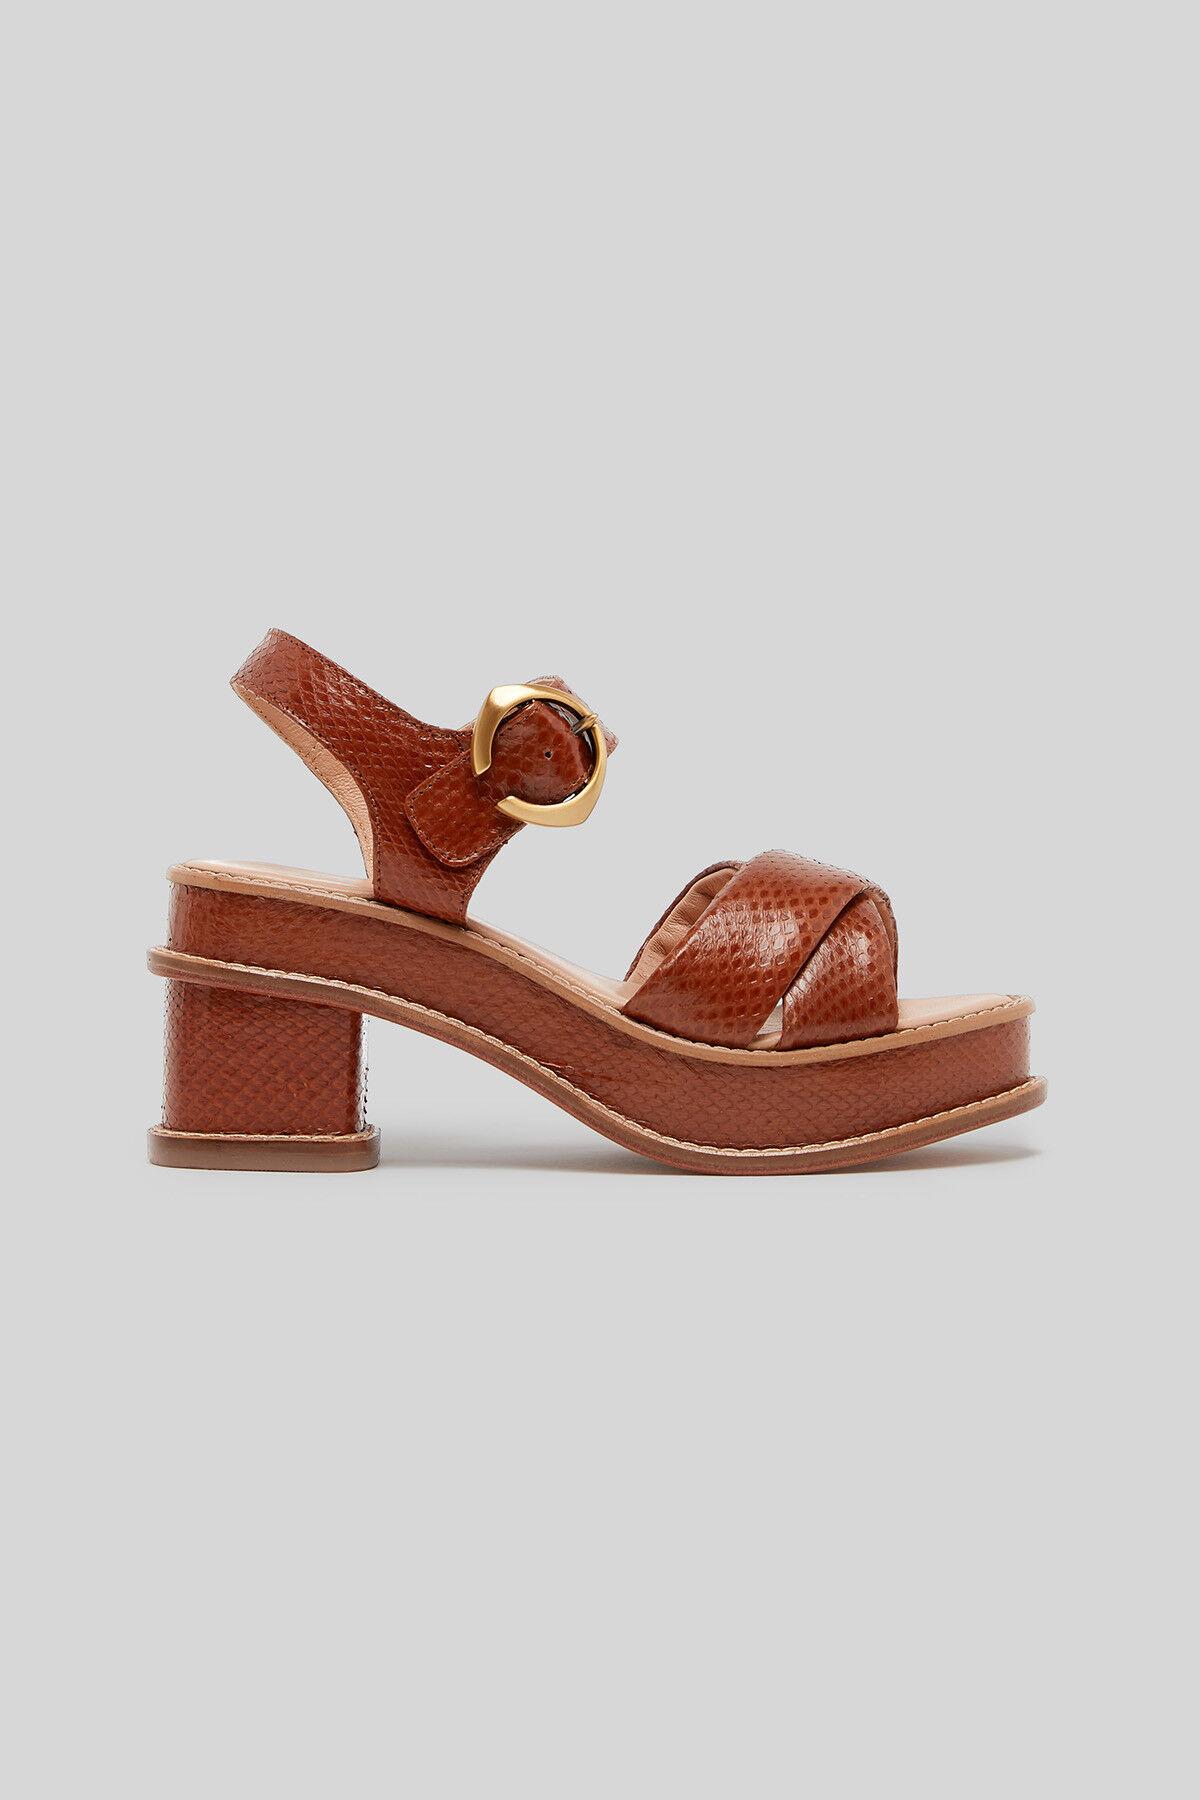 Sandalo Exotic Style - Maliparmi